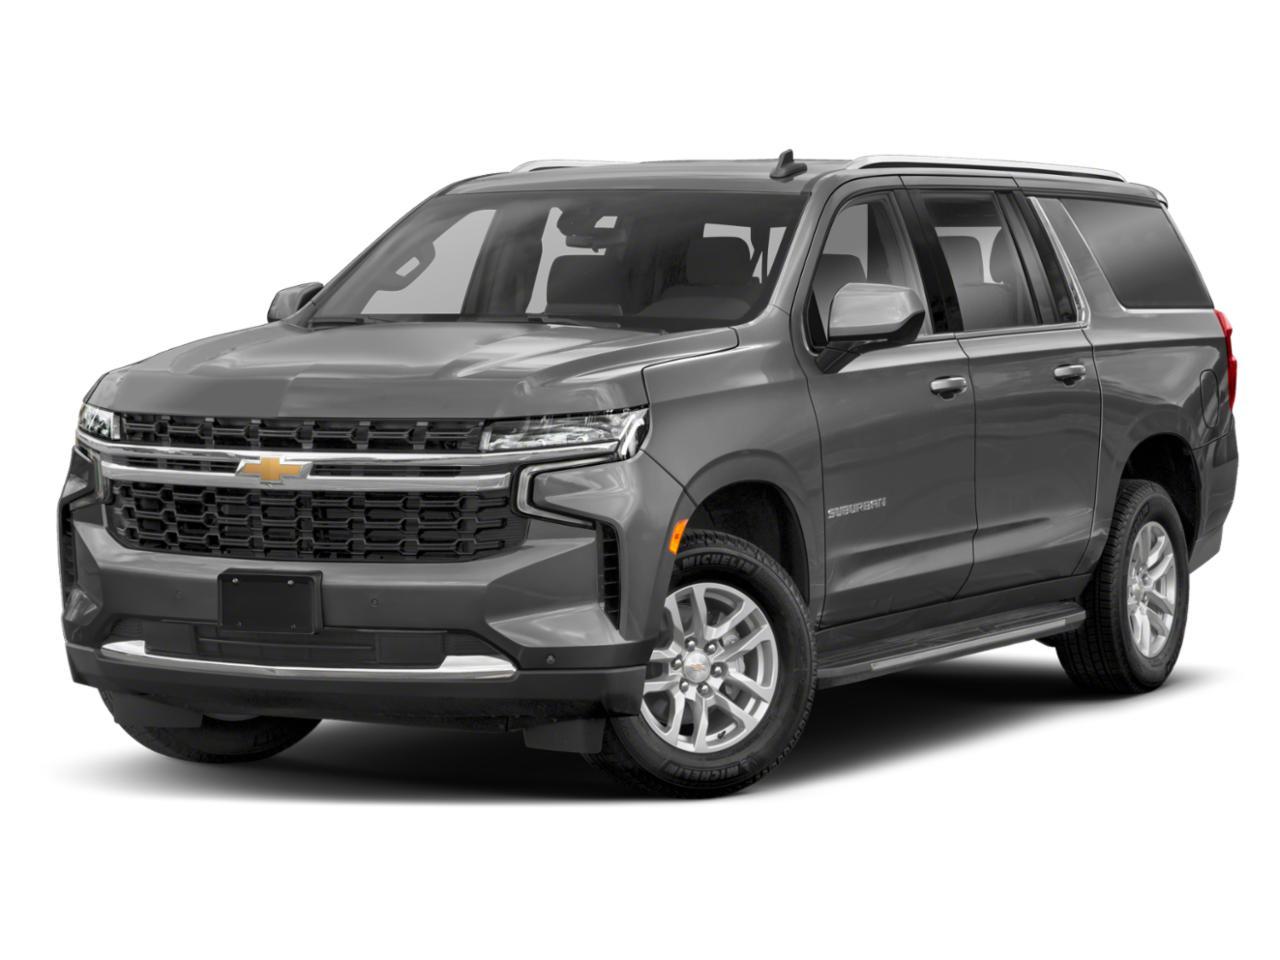 2021 Chevrolet Suburban Vehicle Photo in Menomonie, WI 54751